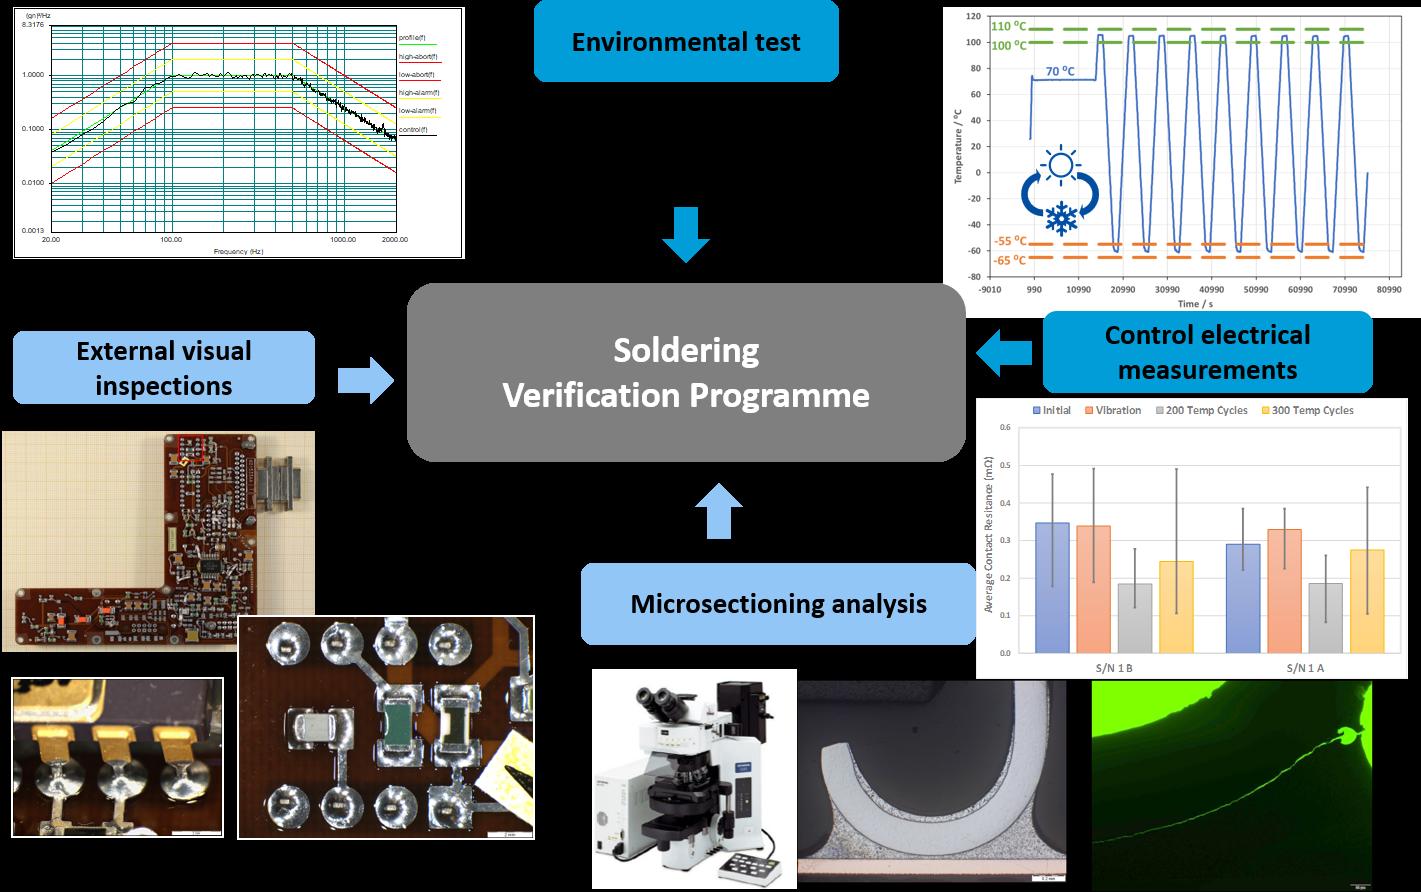 Soldering Verification Processes